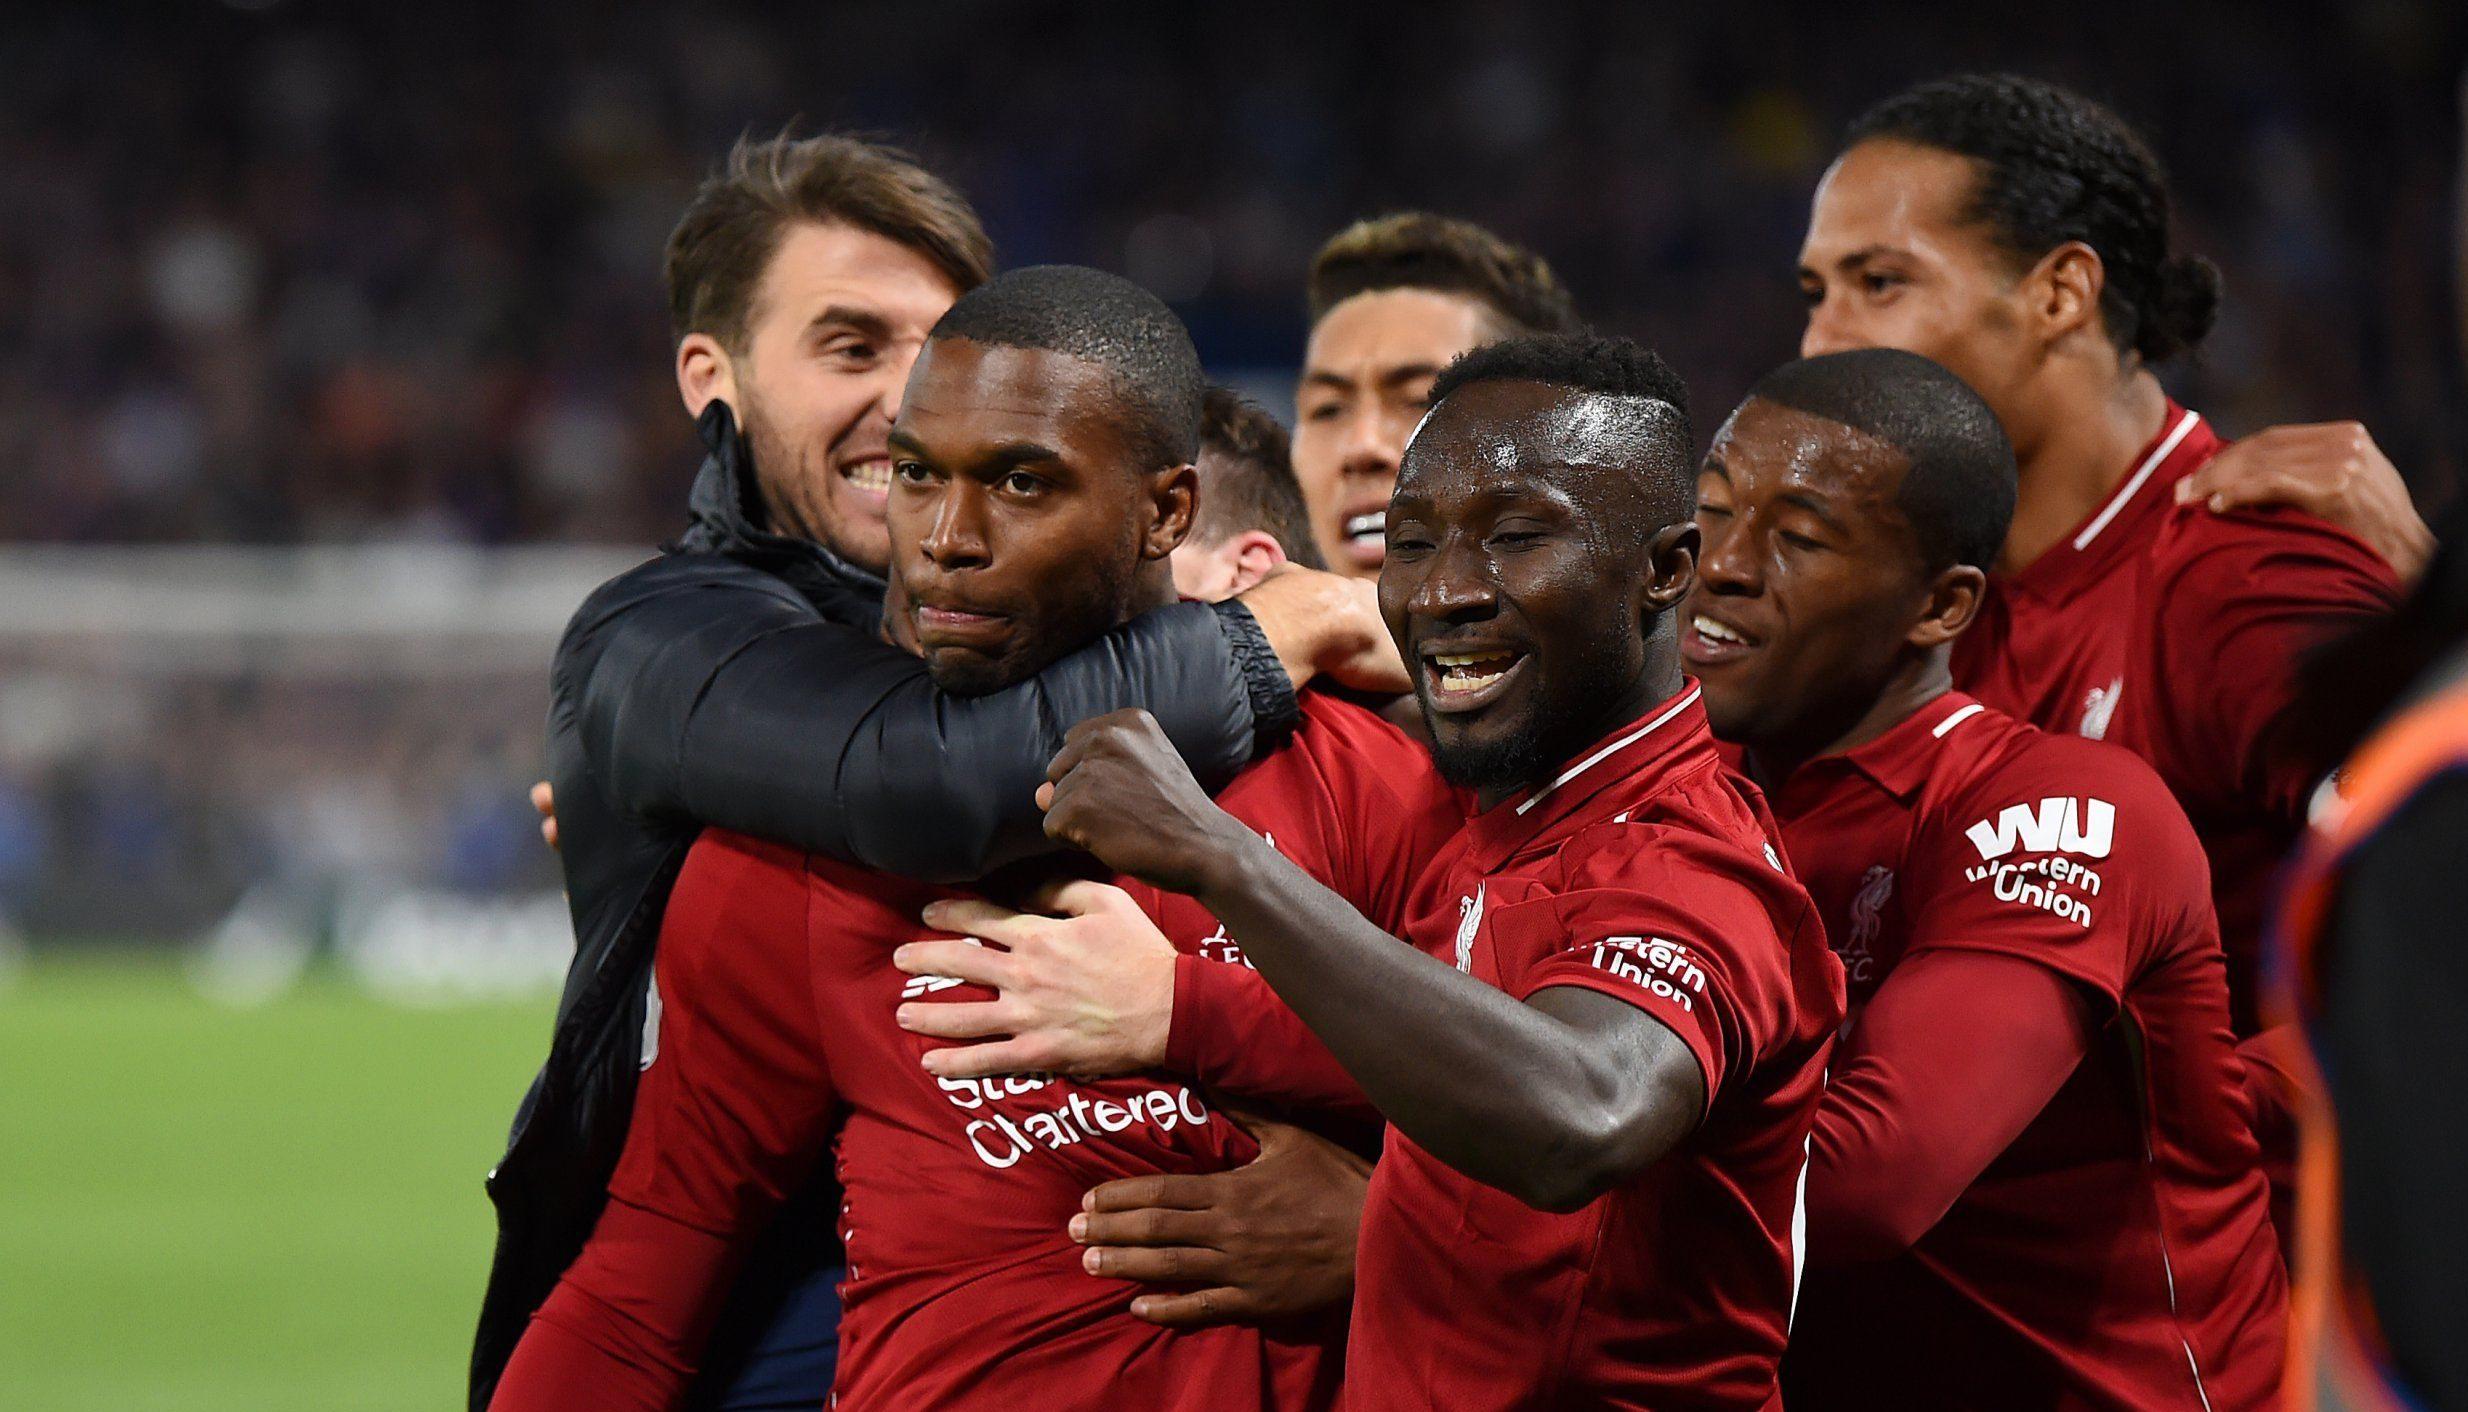 Napoli vs Liverpool TV channel, live stream, kick-off time, odds and team news